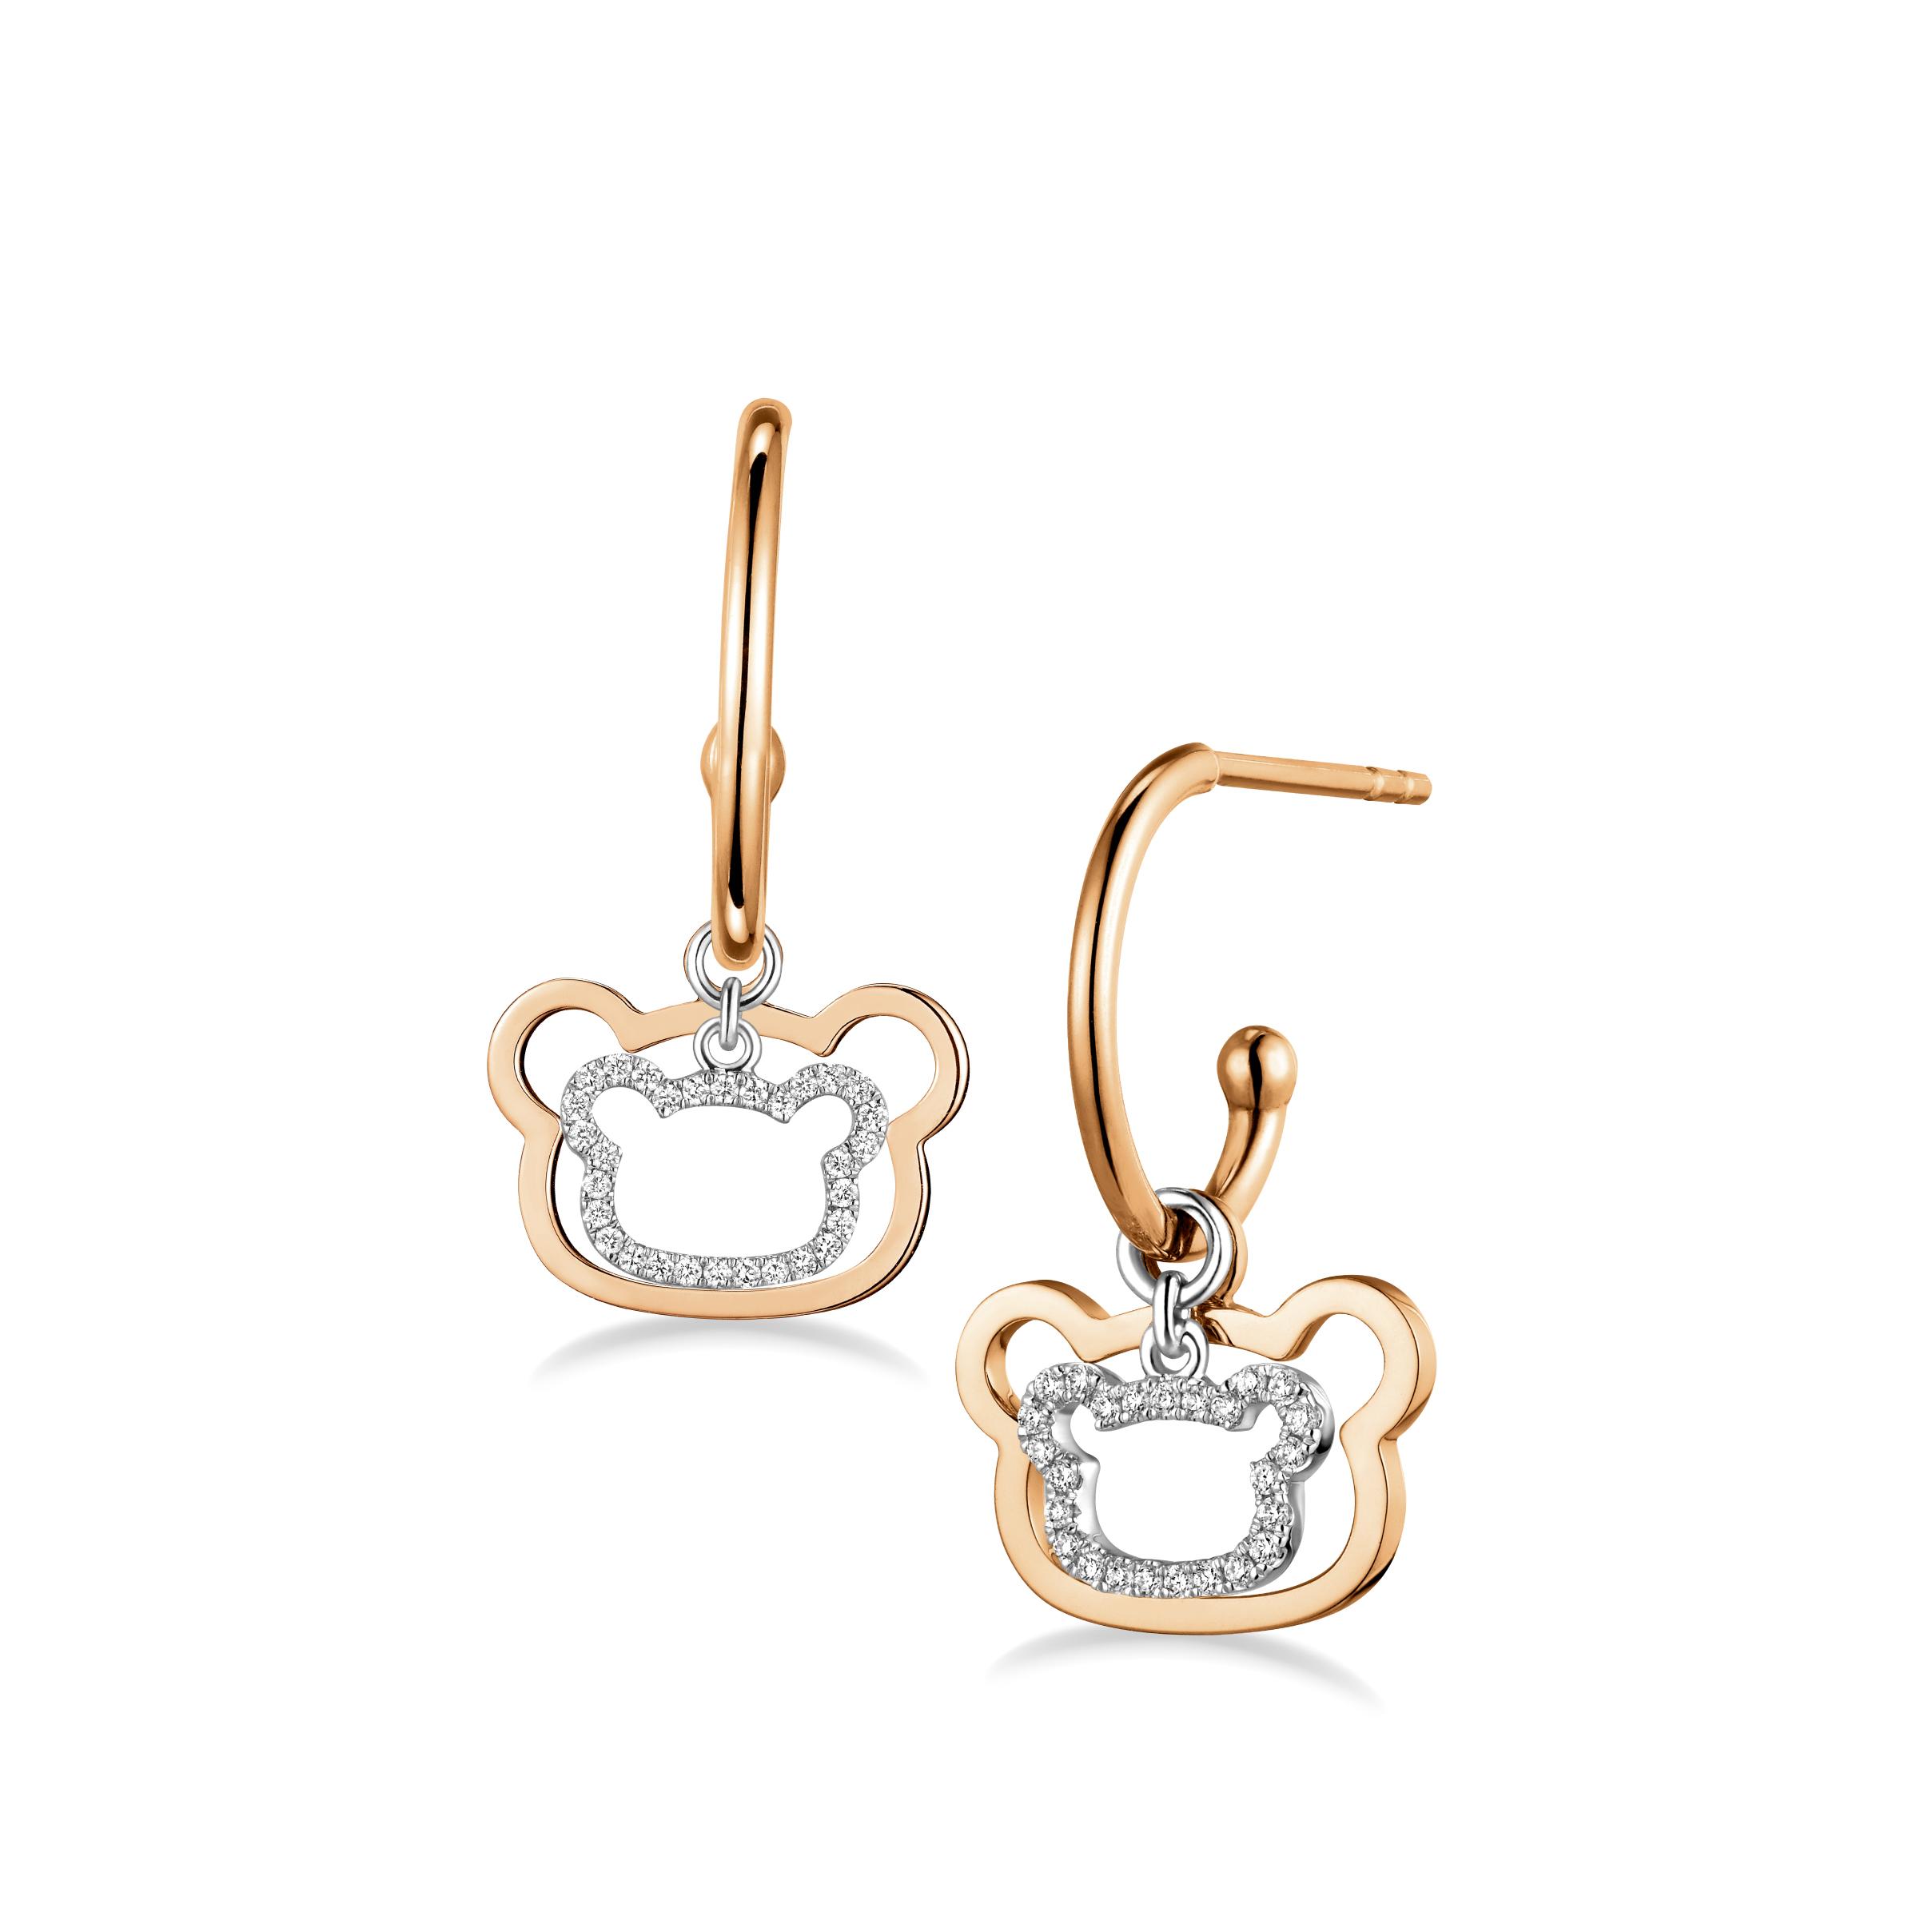 Rilakkuma™Collection 18K Gold Diamond Earrings